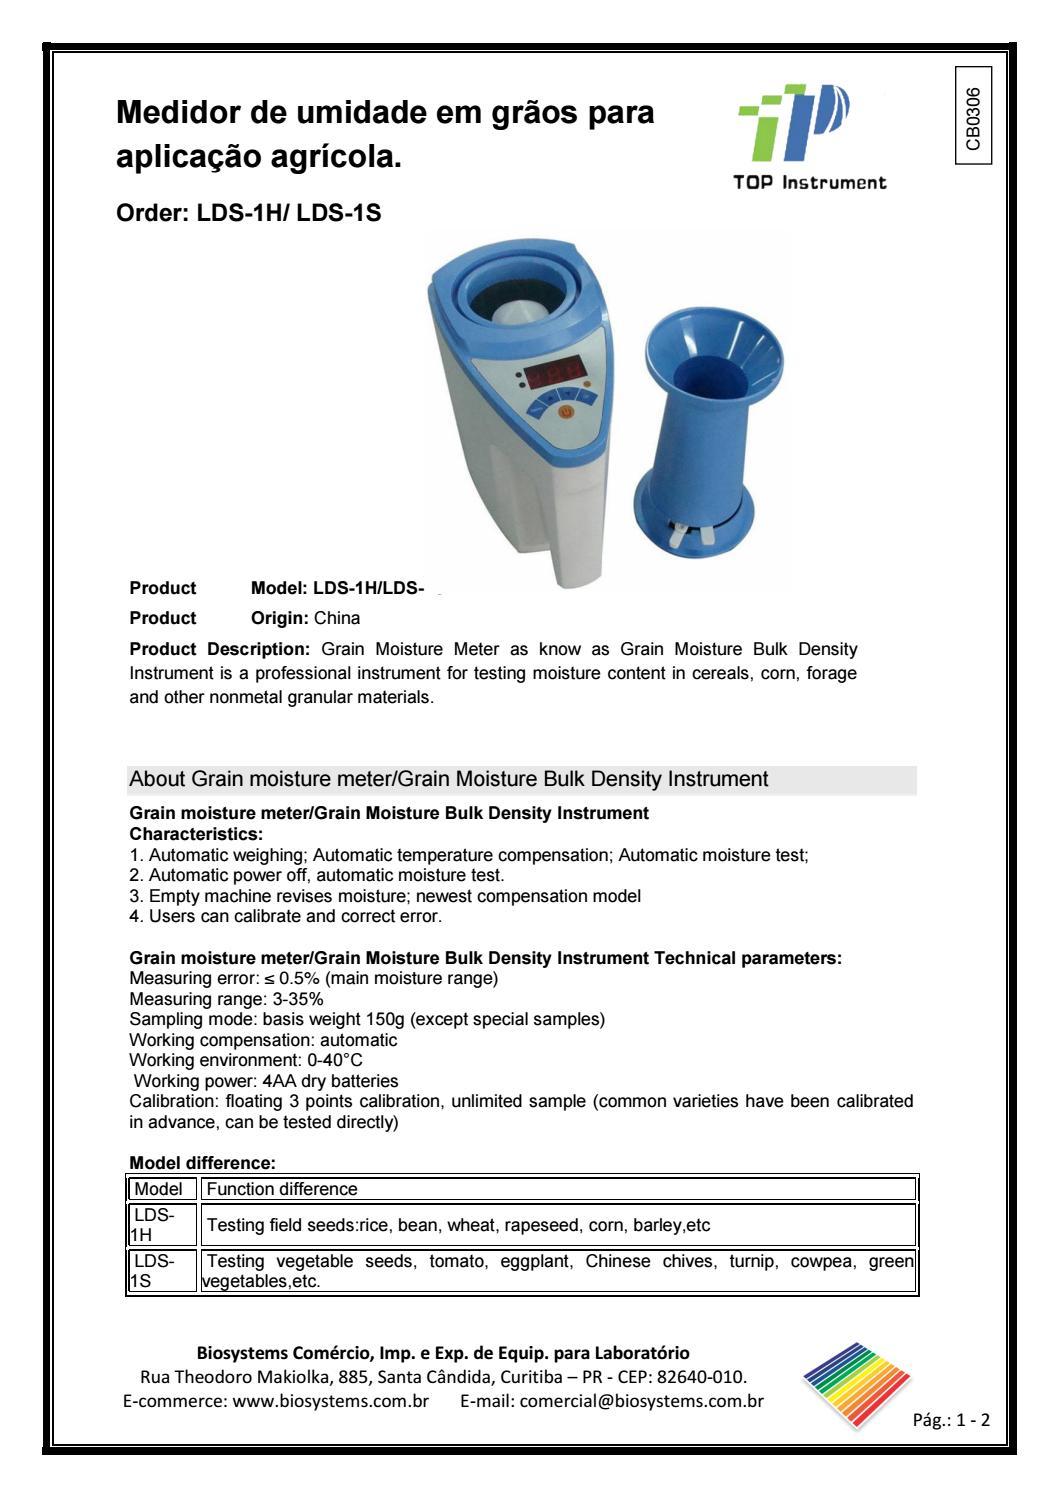 Cb0306 top lds 1h 1s 1g by Biosystems Importadora Ltda - issuu